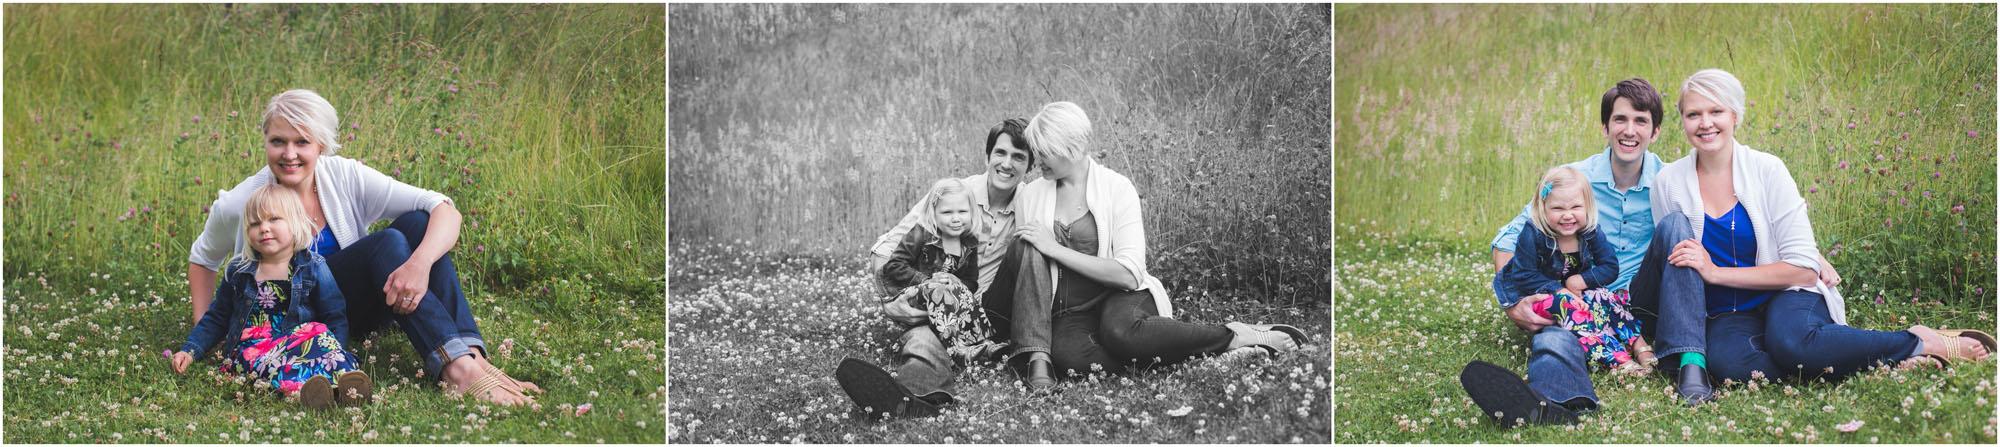 ashley vos photography seattle lifestyle family photographer_0218.jpg